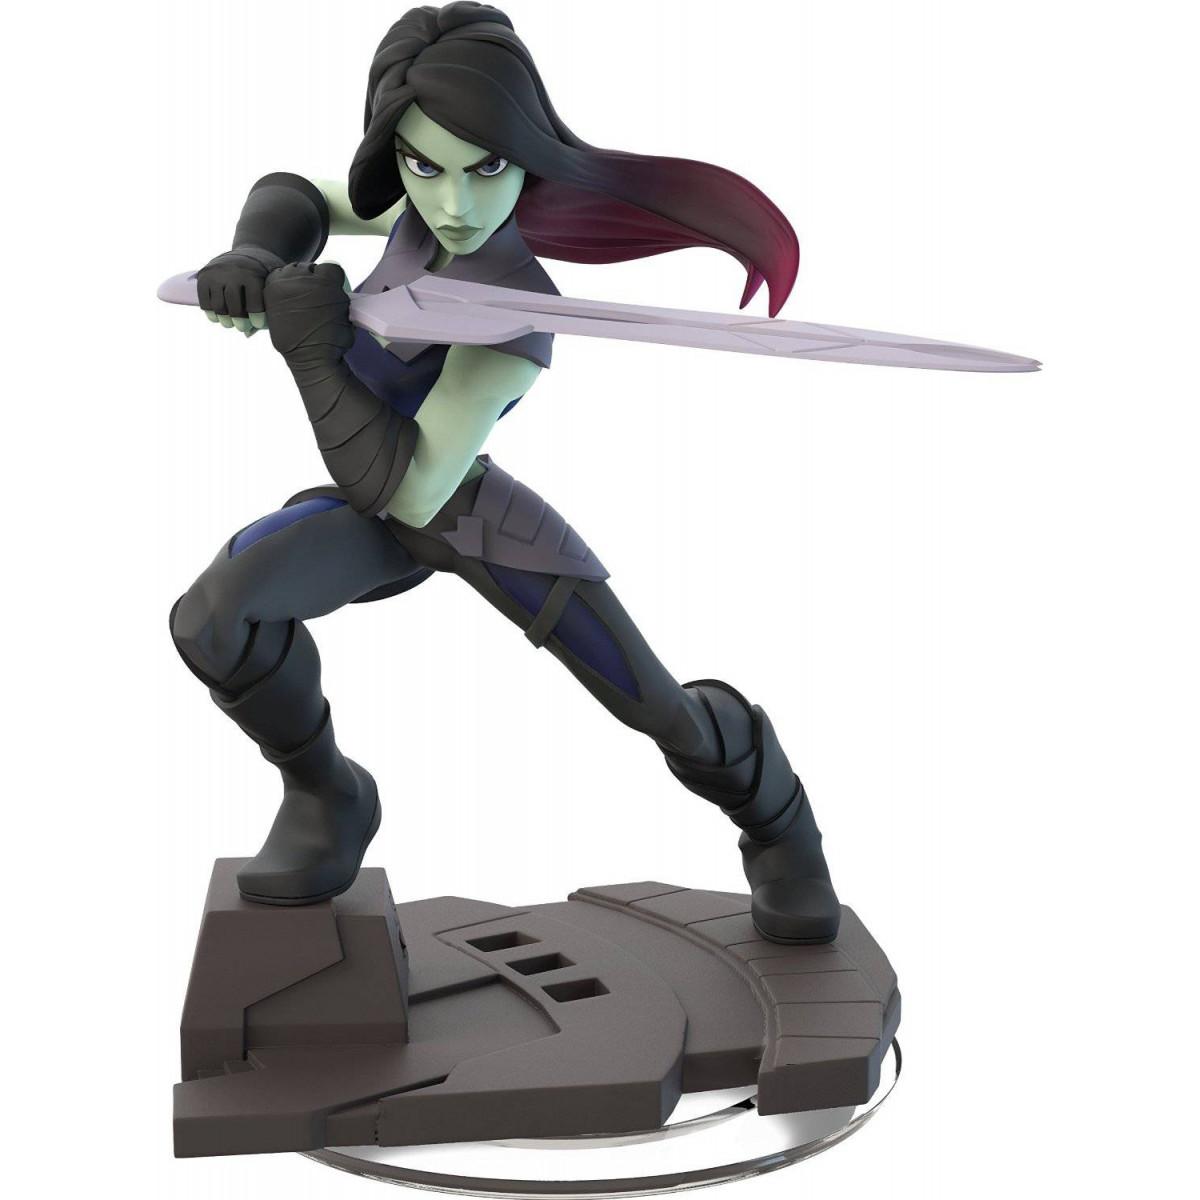 Disney Infinity 2.0 - Gamora játékfigura